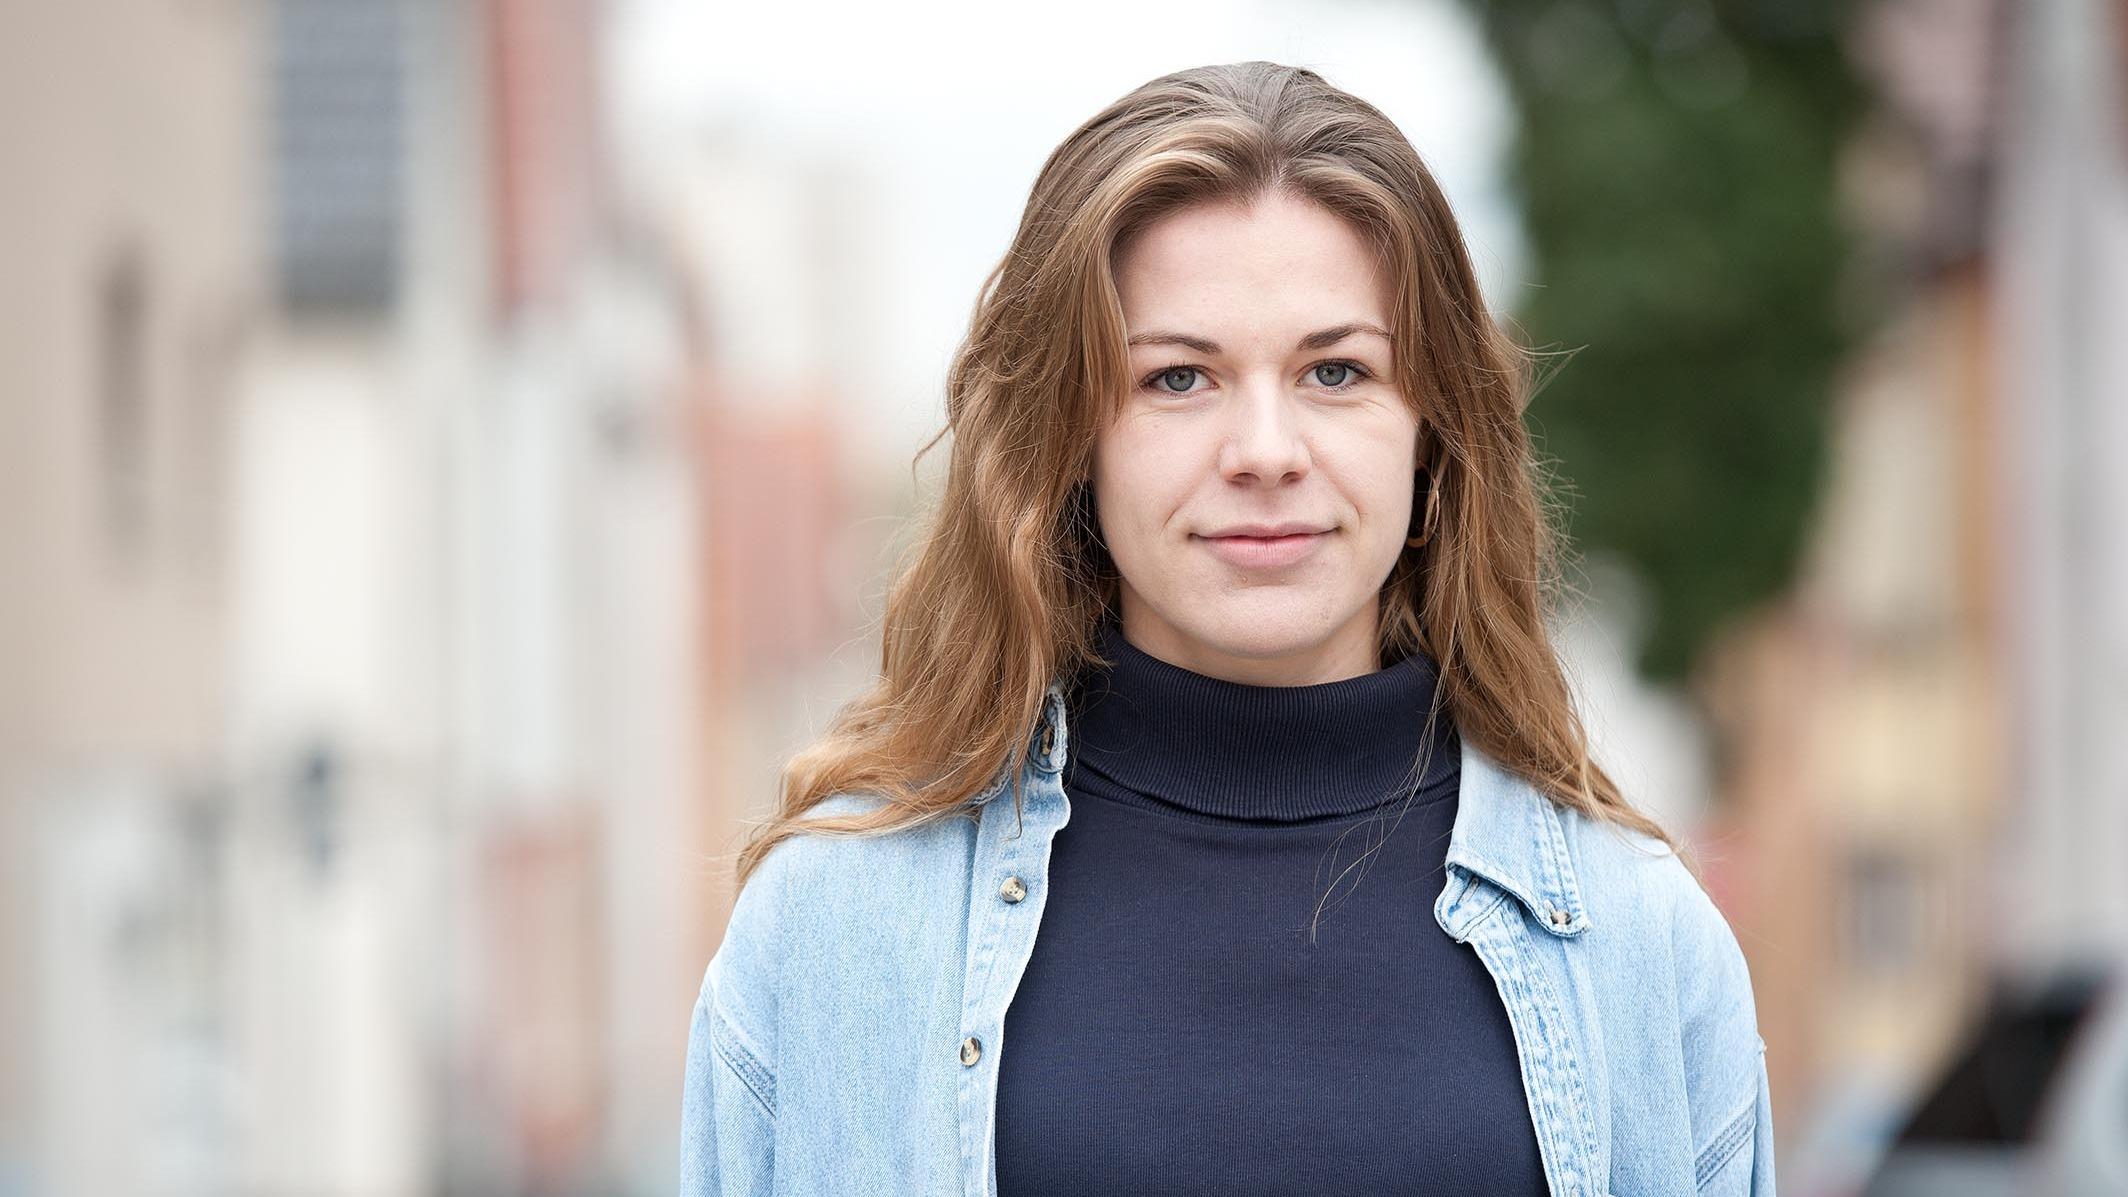 Sarah Heim